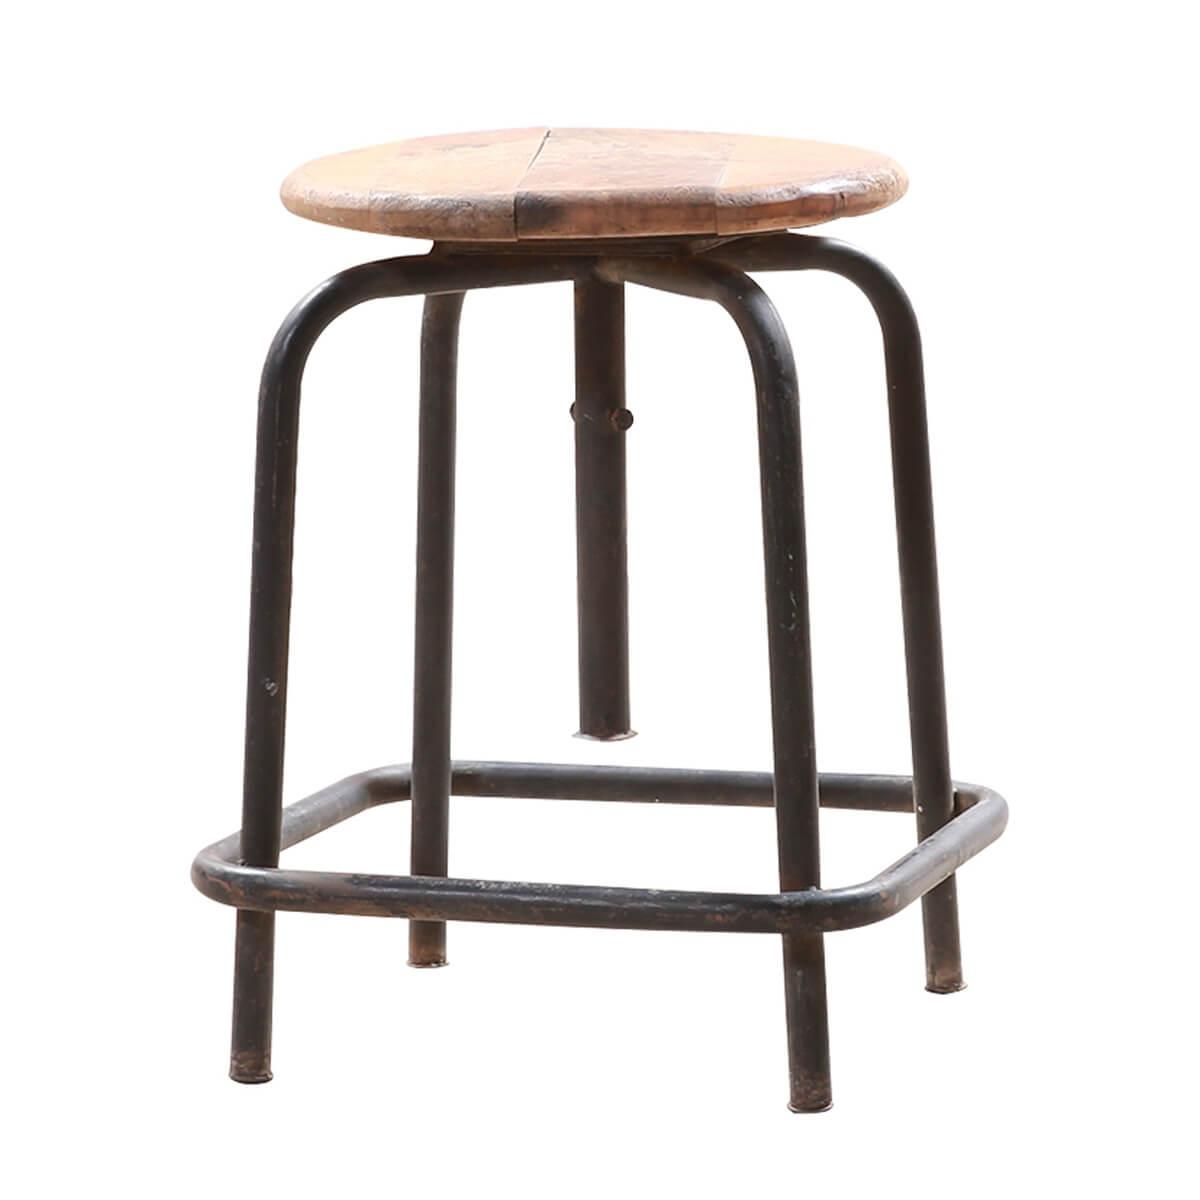 "Solid Wood 17"" Round Bar Stool"